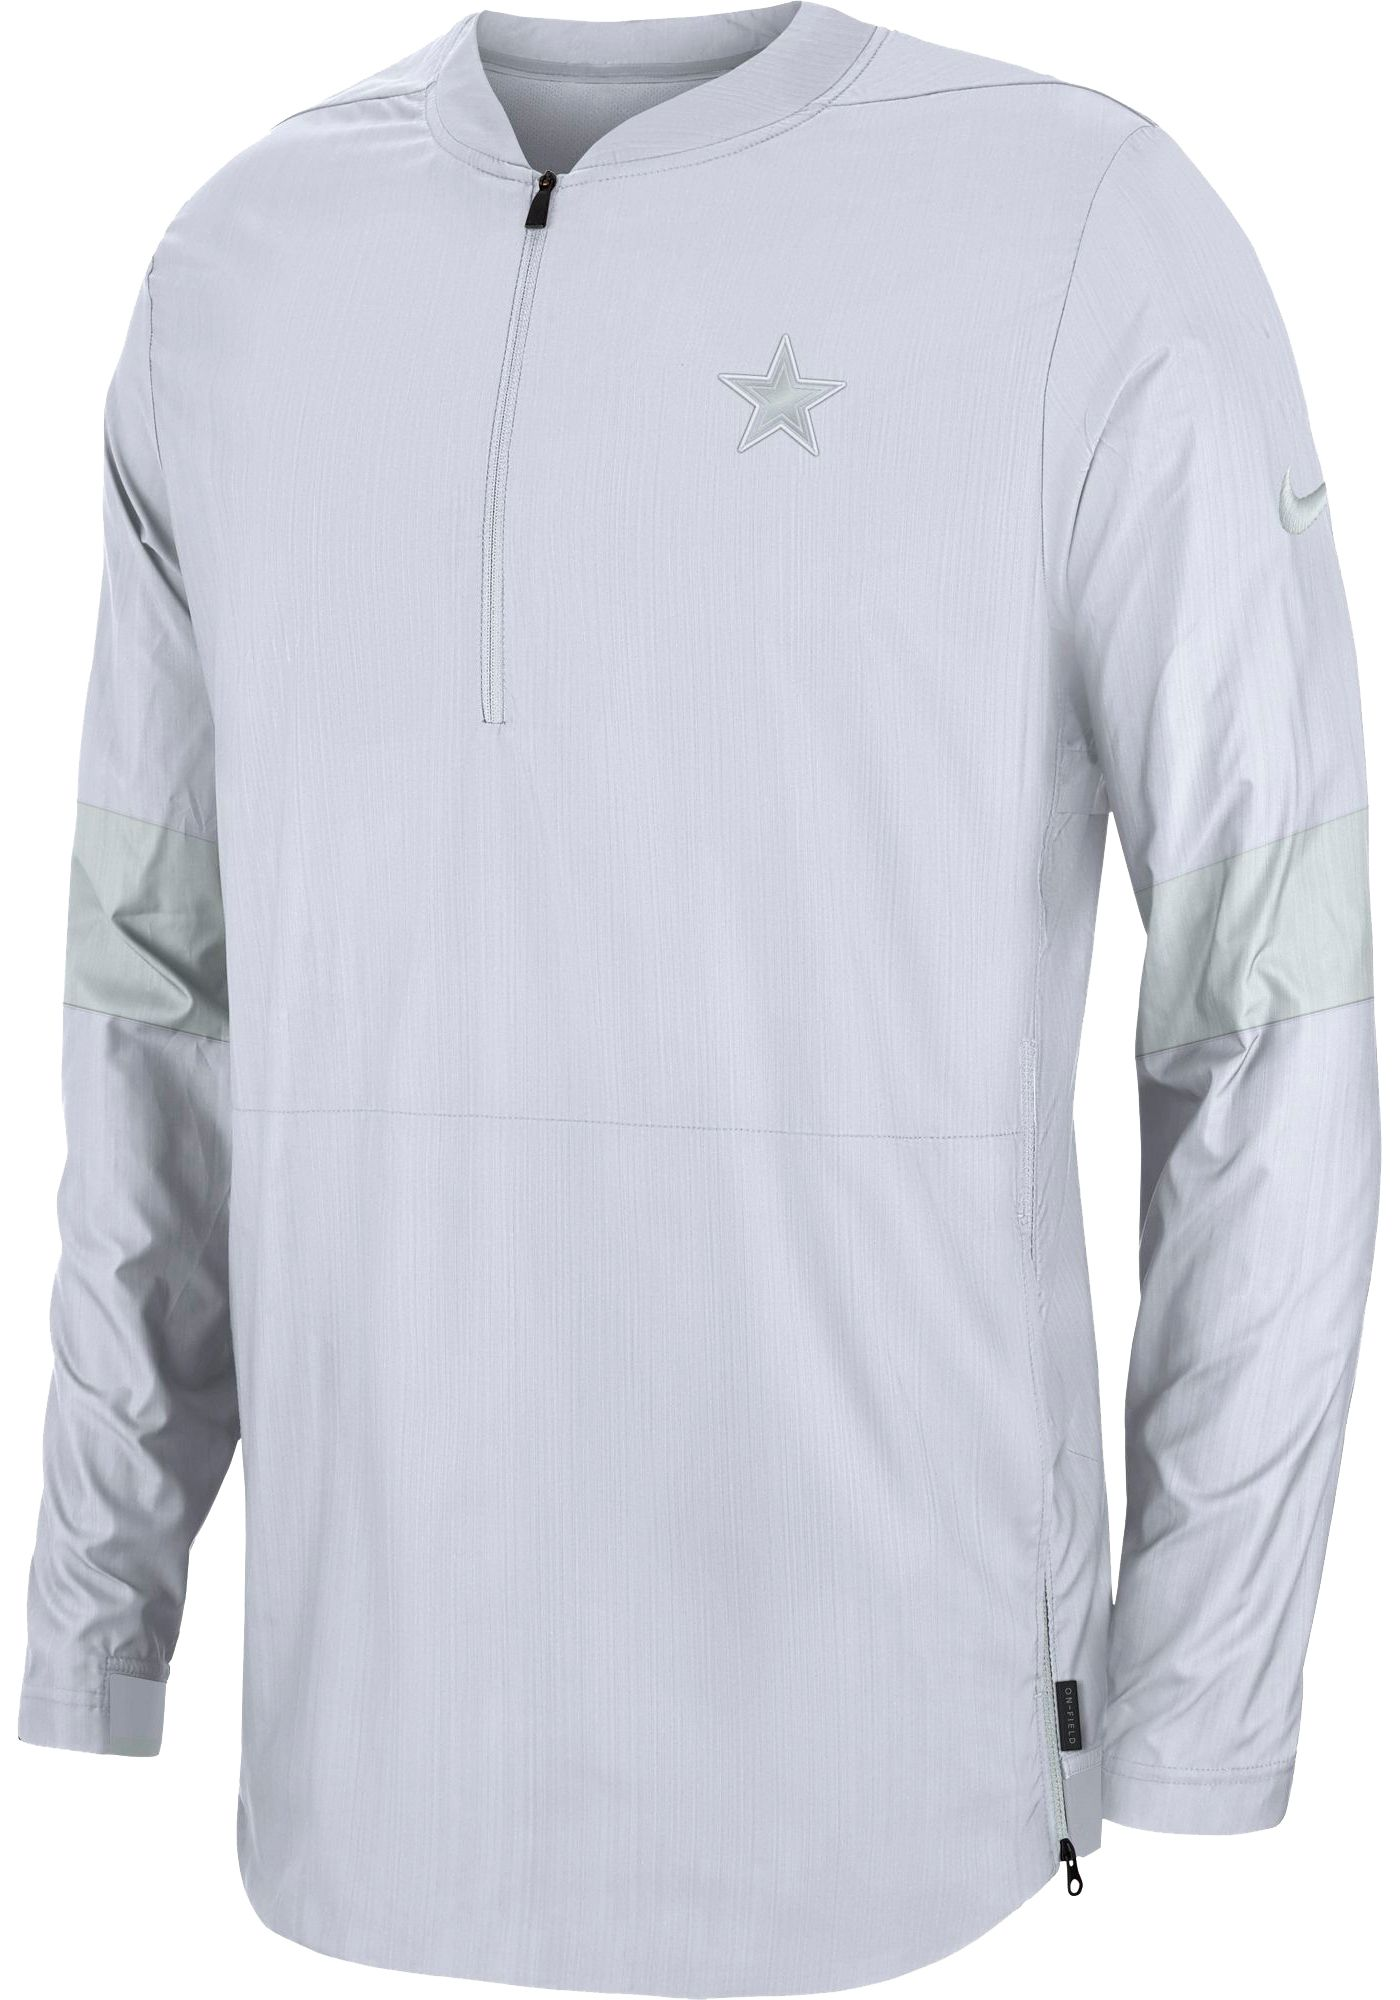 Nike Men's Dallas Cowboys Sideline Coach White Half-Zip Performance Jacket